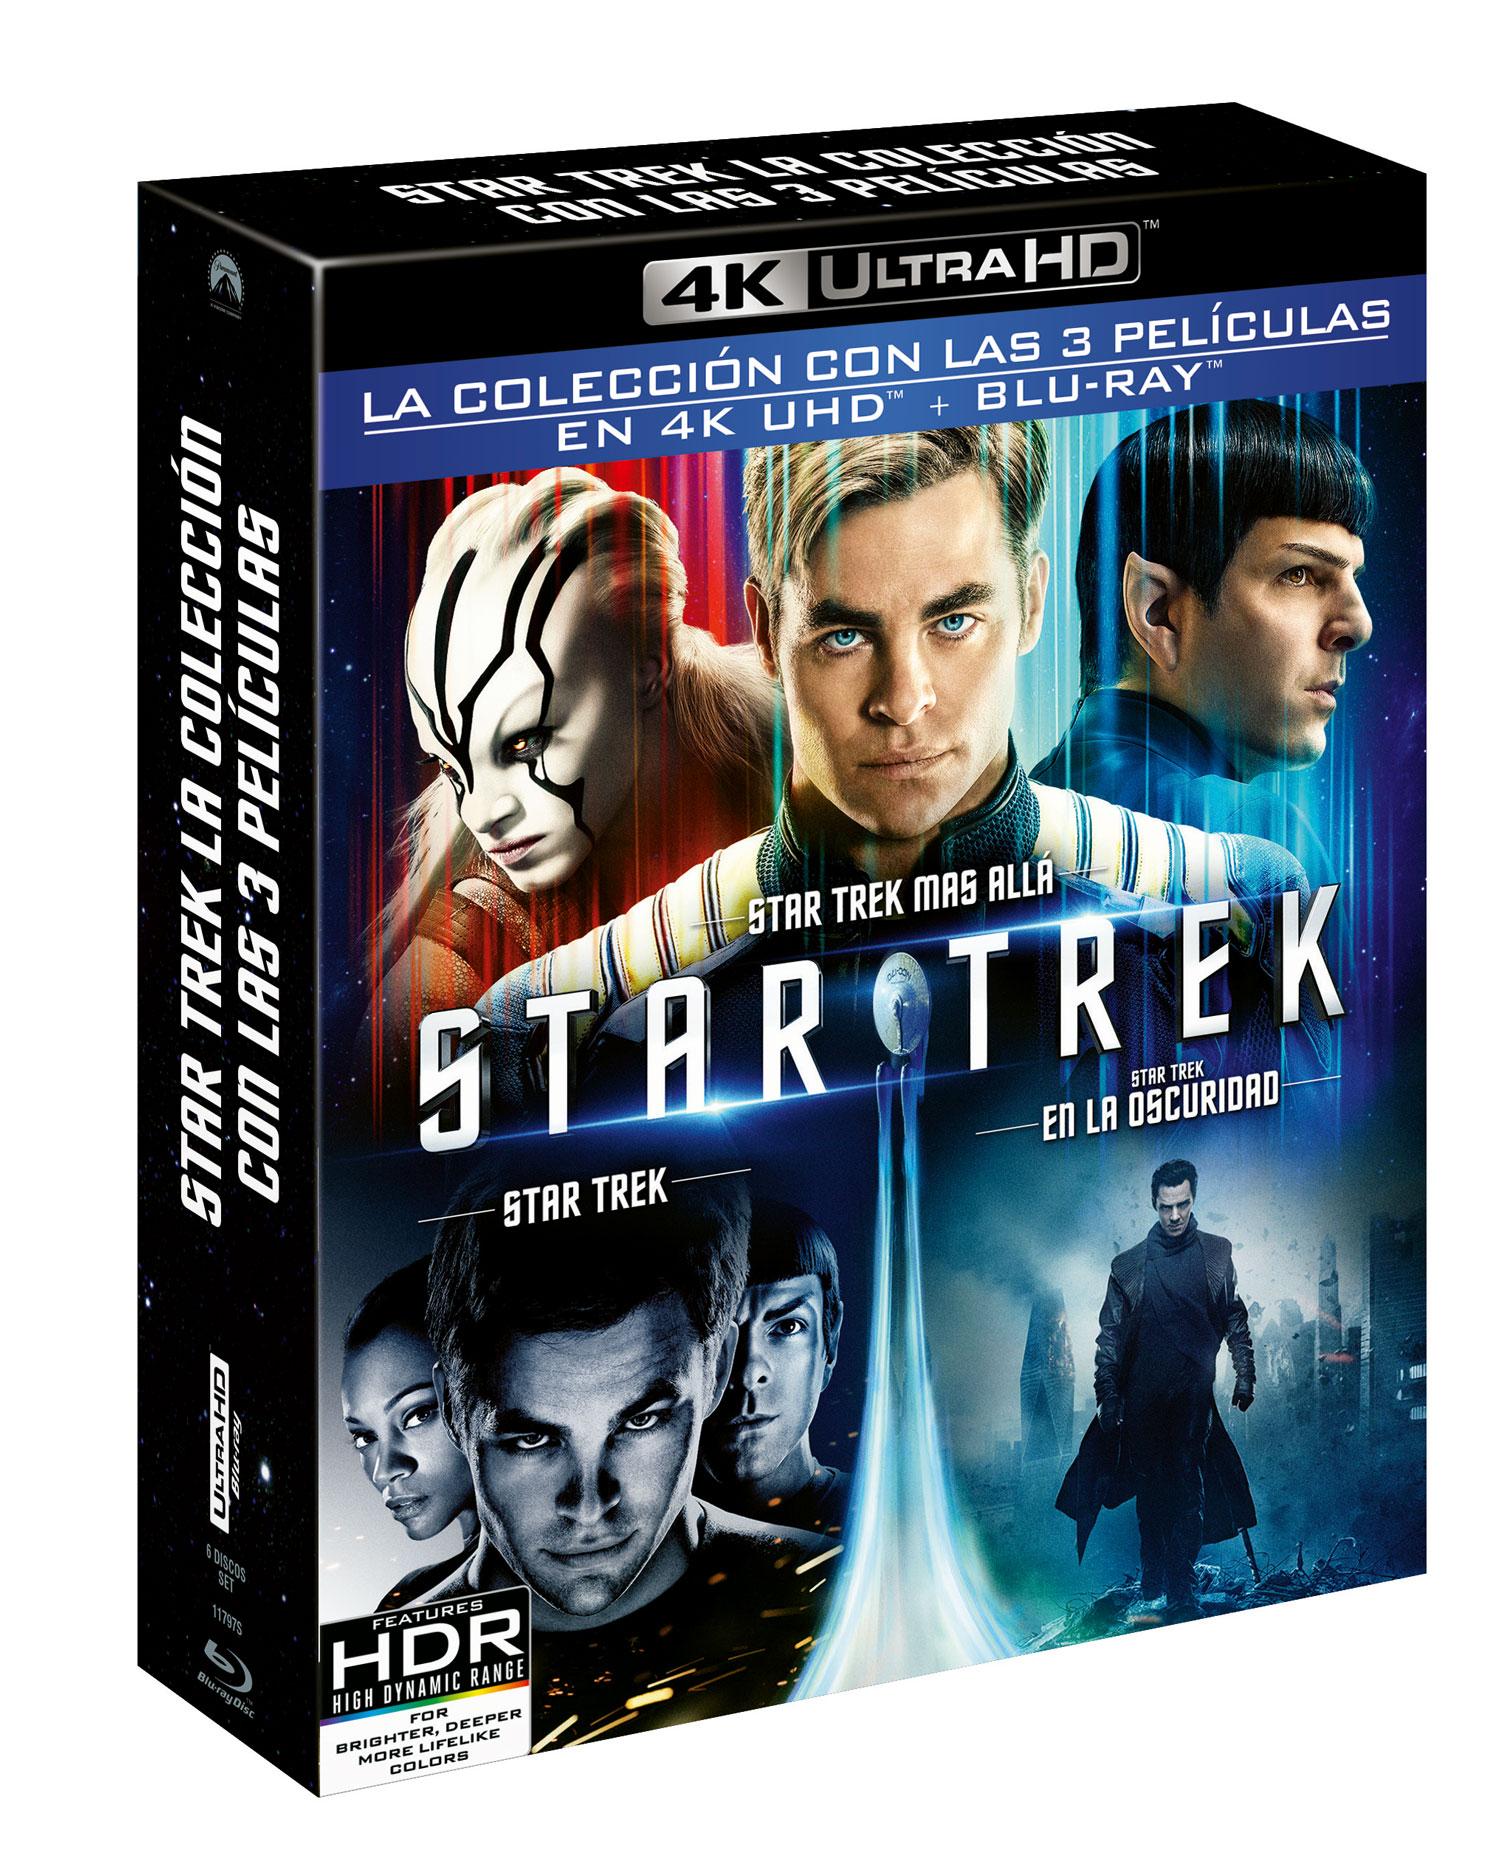 Pack 'Star Trek' 4K Ultra HD